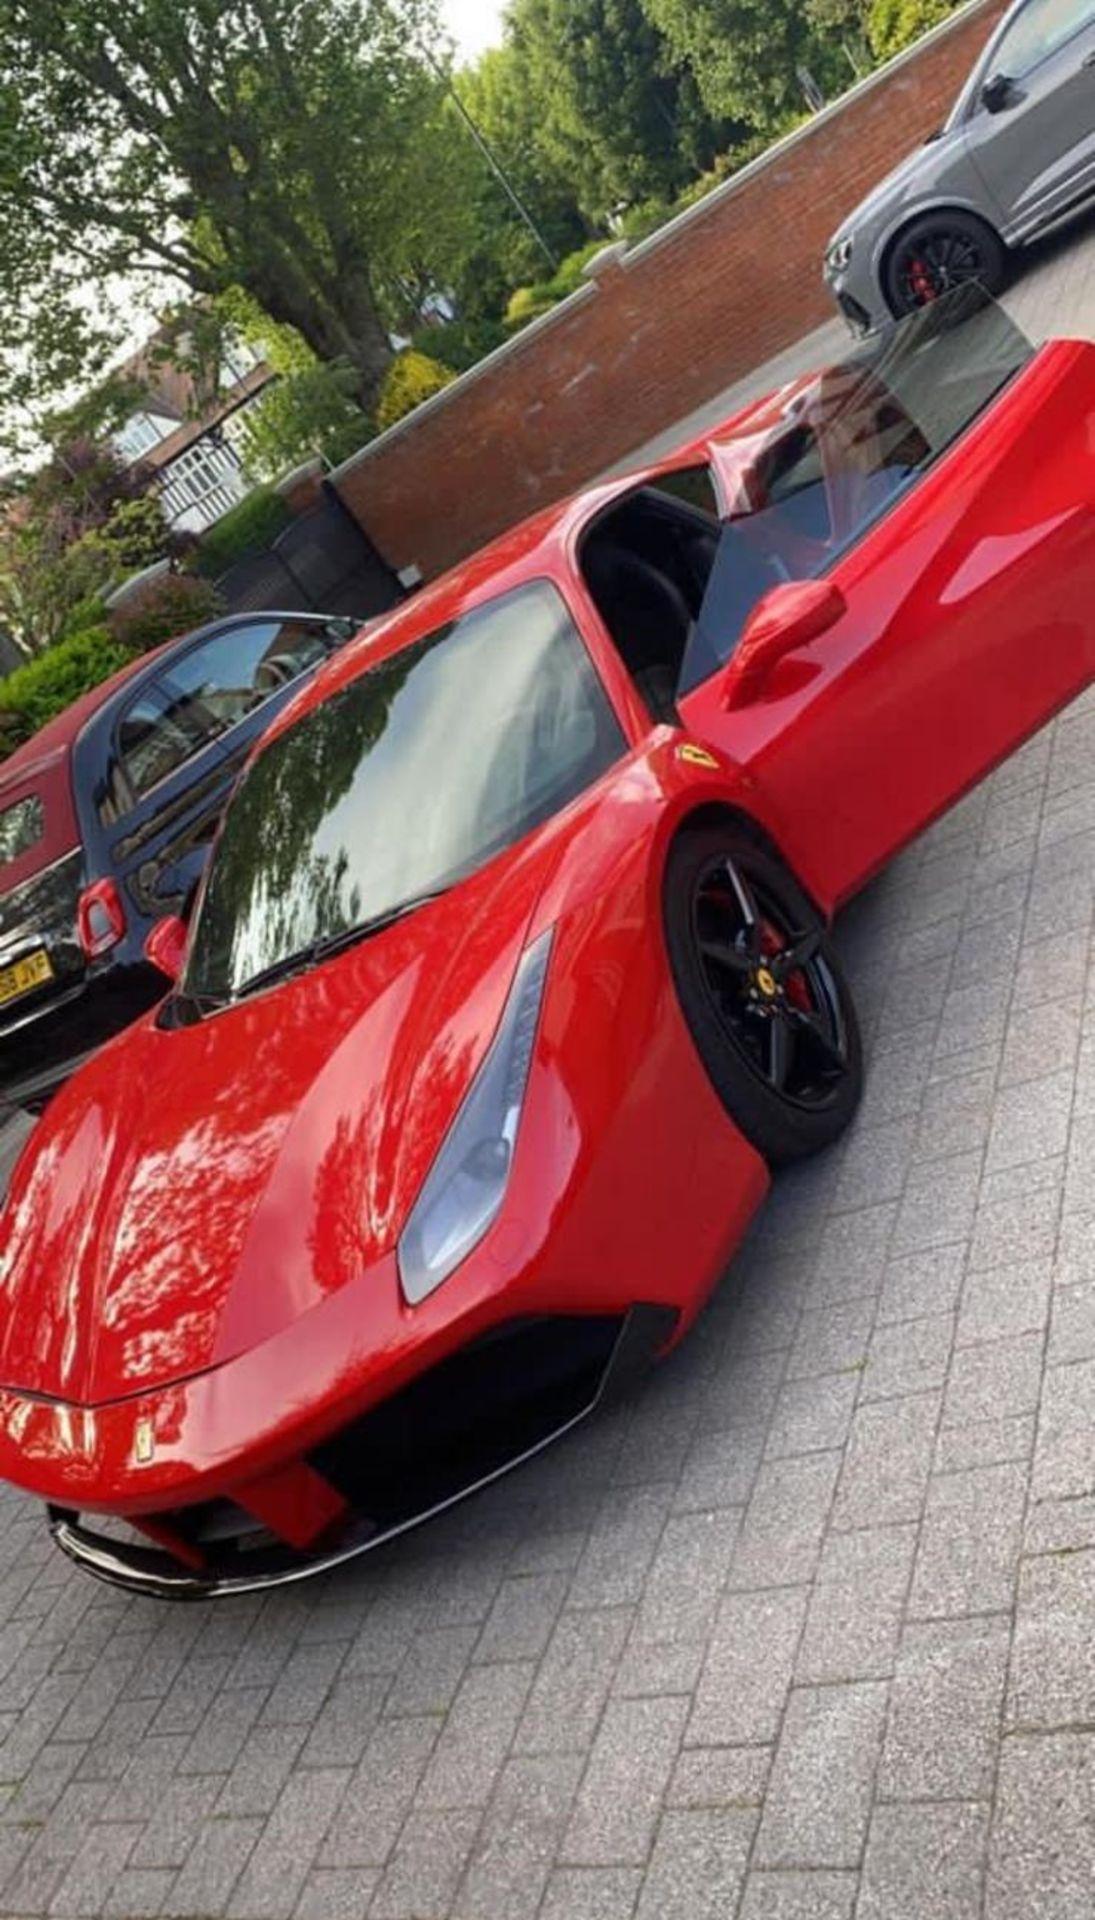 2016 FERRARI 488 GTB 2DR RED COUPE, PETROL, AUTOMATIC, 11K MILES, LEFT HAND DRIVE *NO VAT* - Image 2 of 22